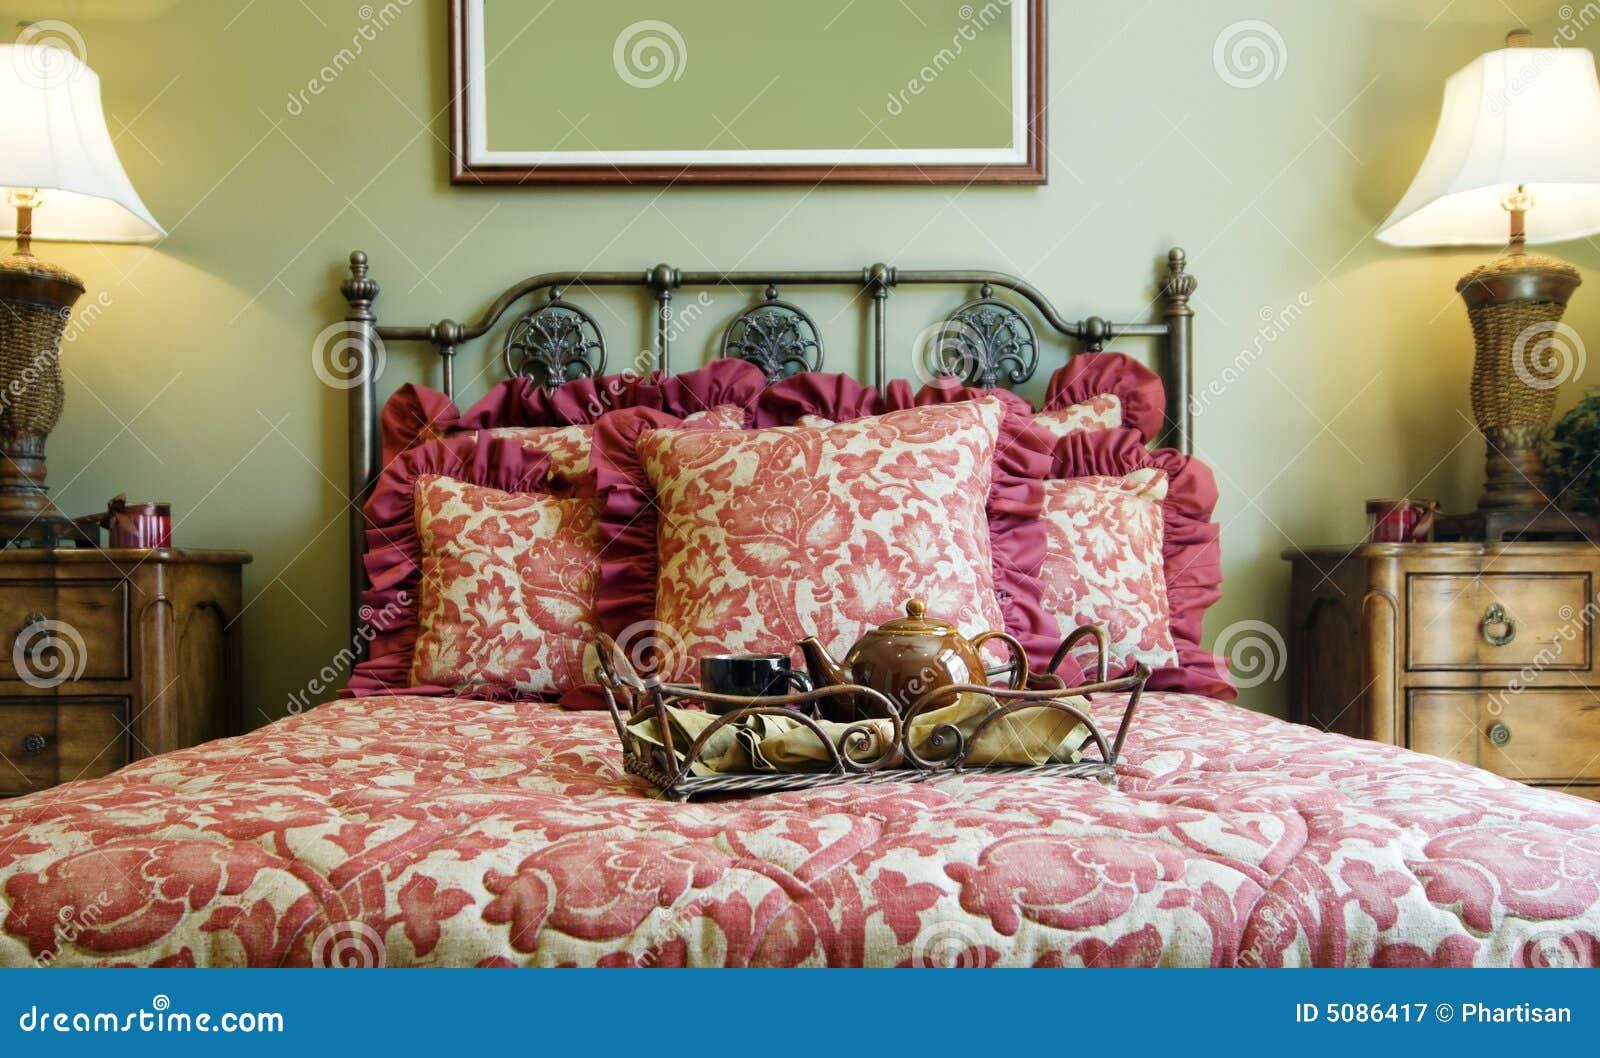 Beautiful showcase bedroom interior royalty free stock for Beautiful bedroom interior